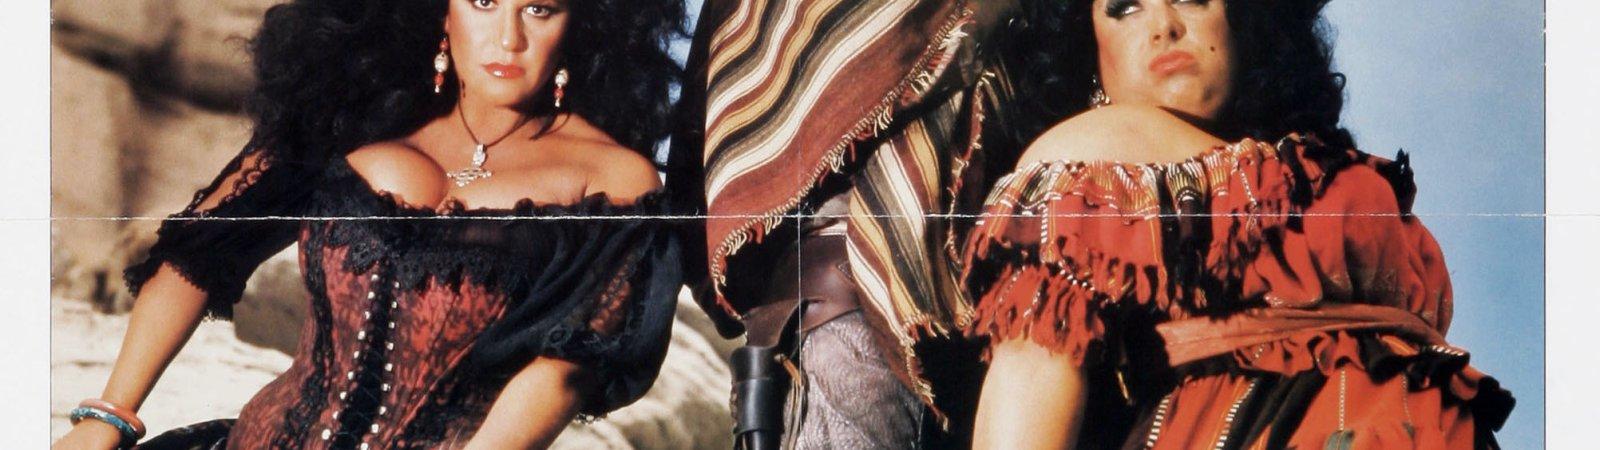 Photo du film : Lust in the dust